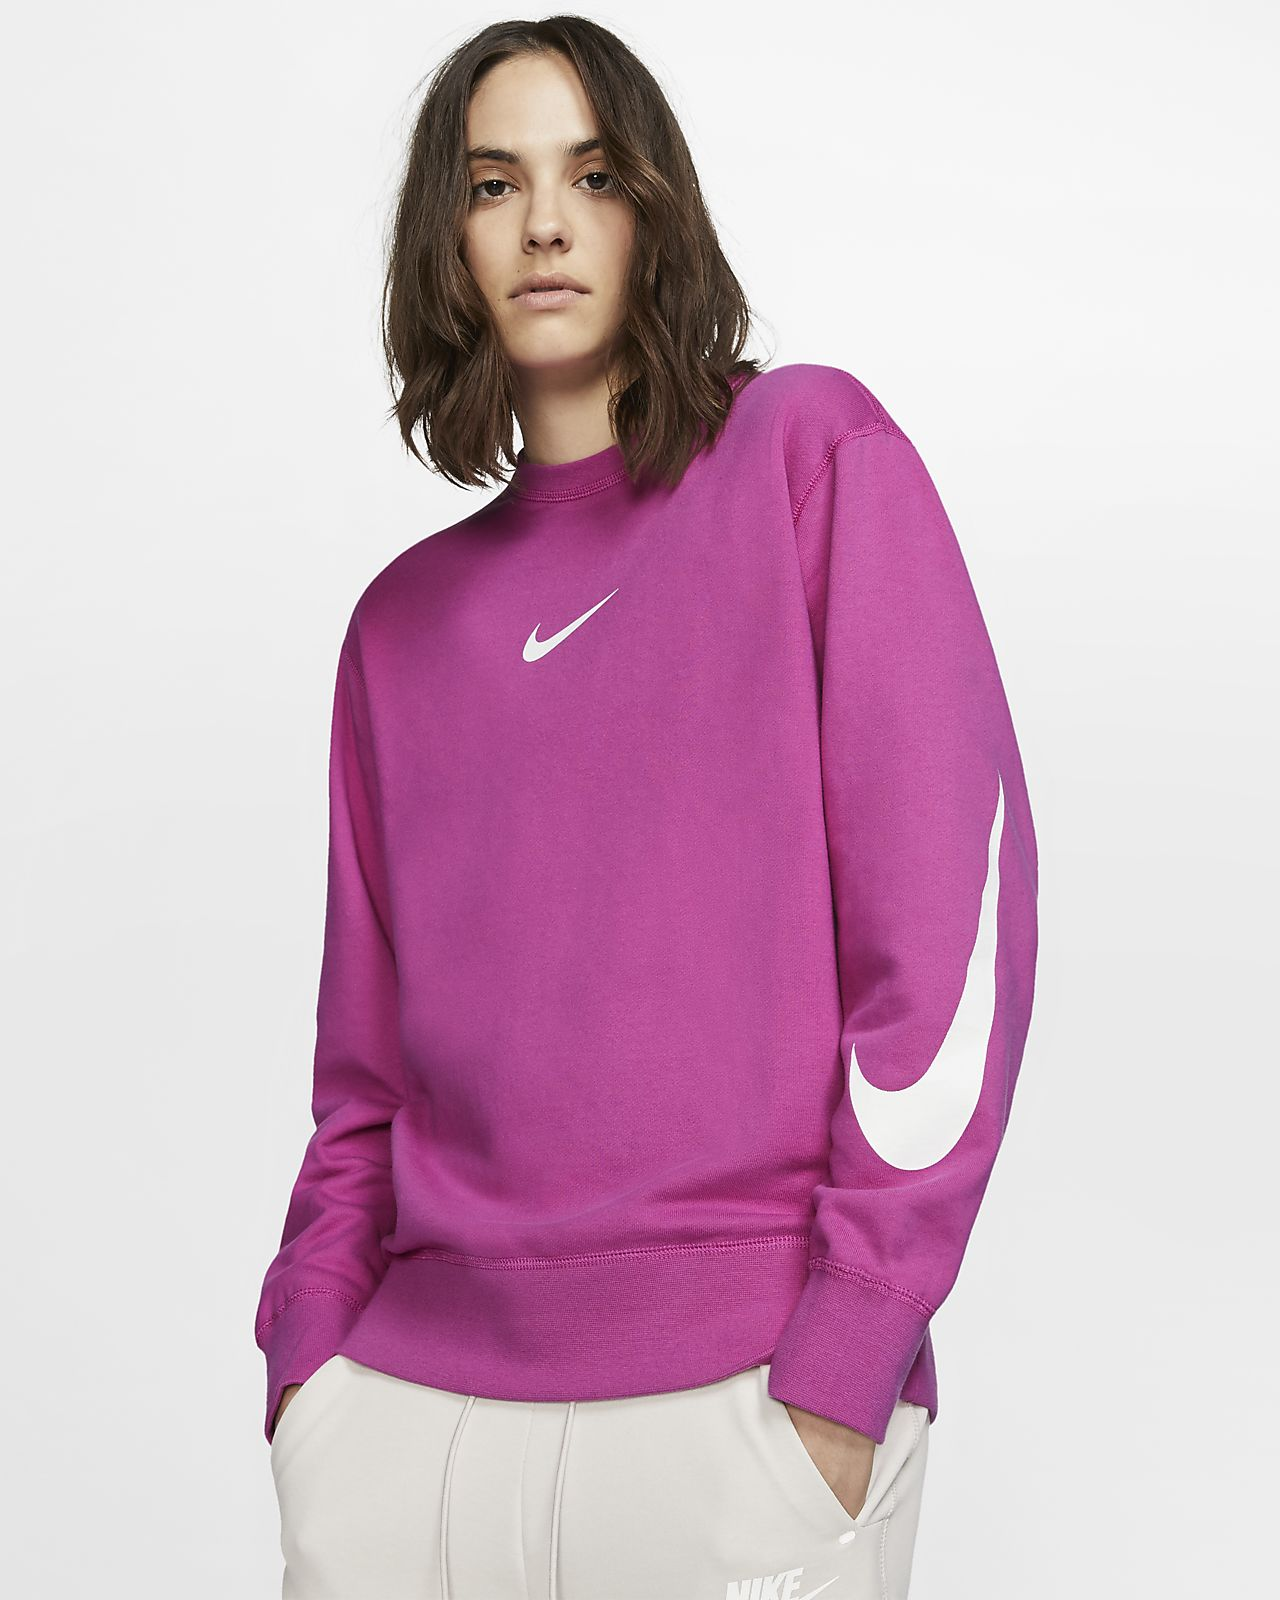 Nike Sportswear Swoosh Sudadera de manga larga de tejido French terry